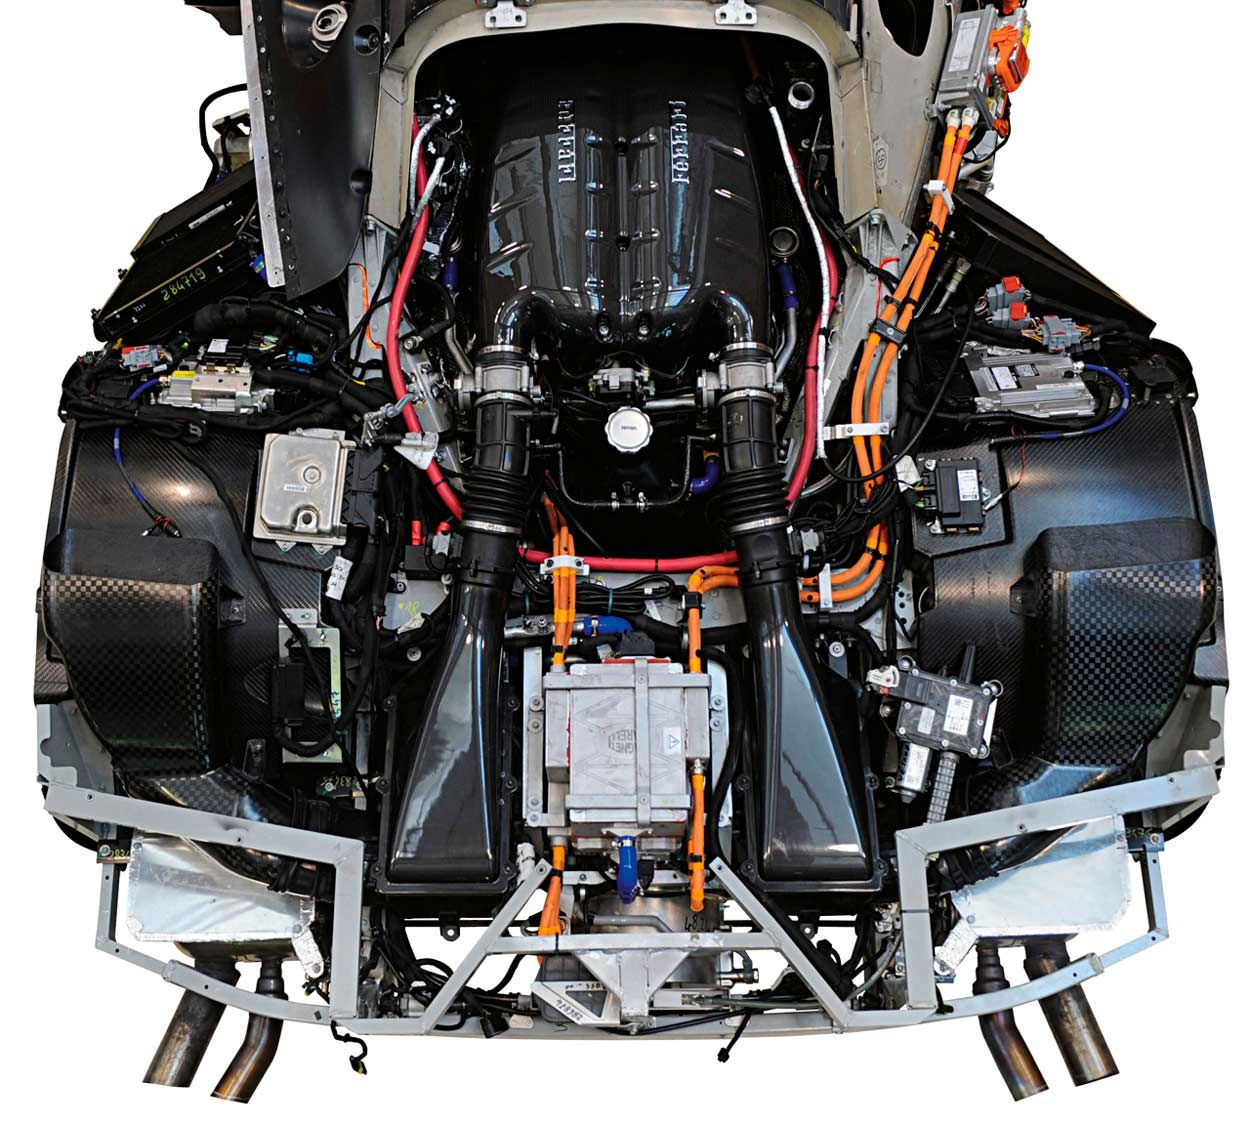 medium resolution of mclaren f1 engine details cars as art mclaren ferrari cars rh pinterest com lamborghini aventador mclaren